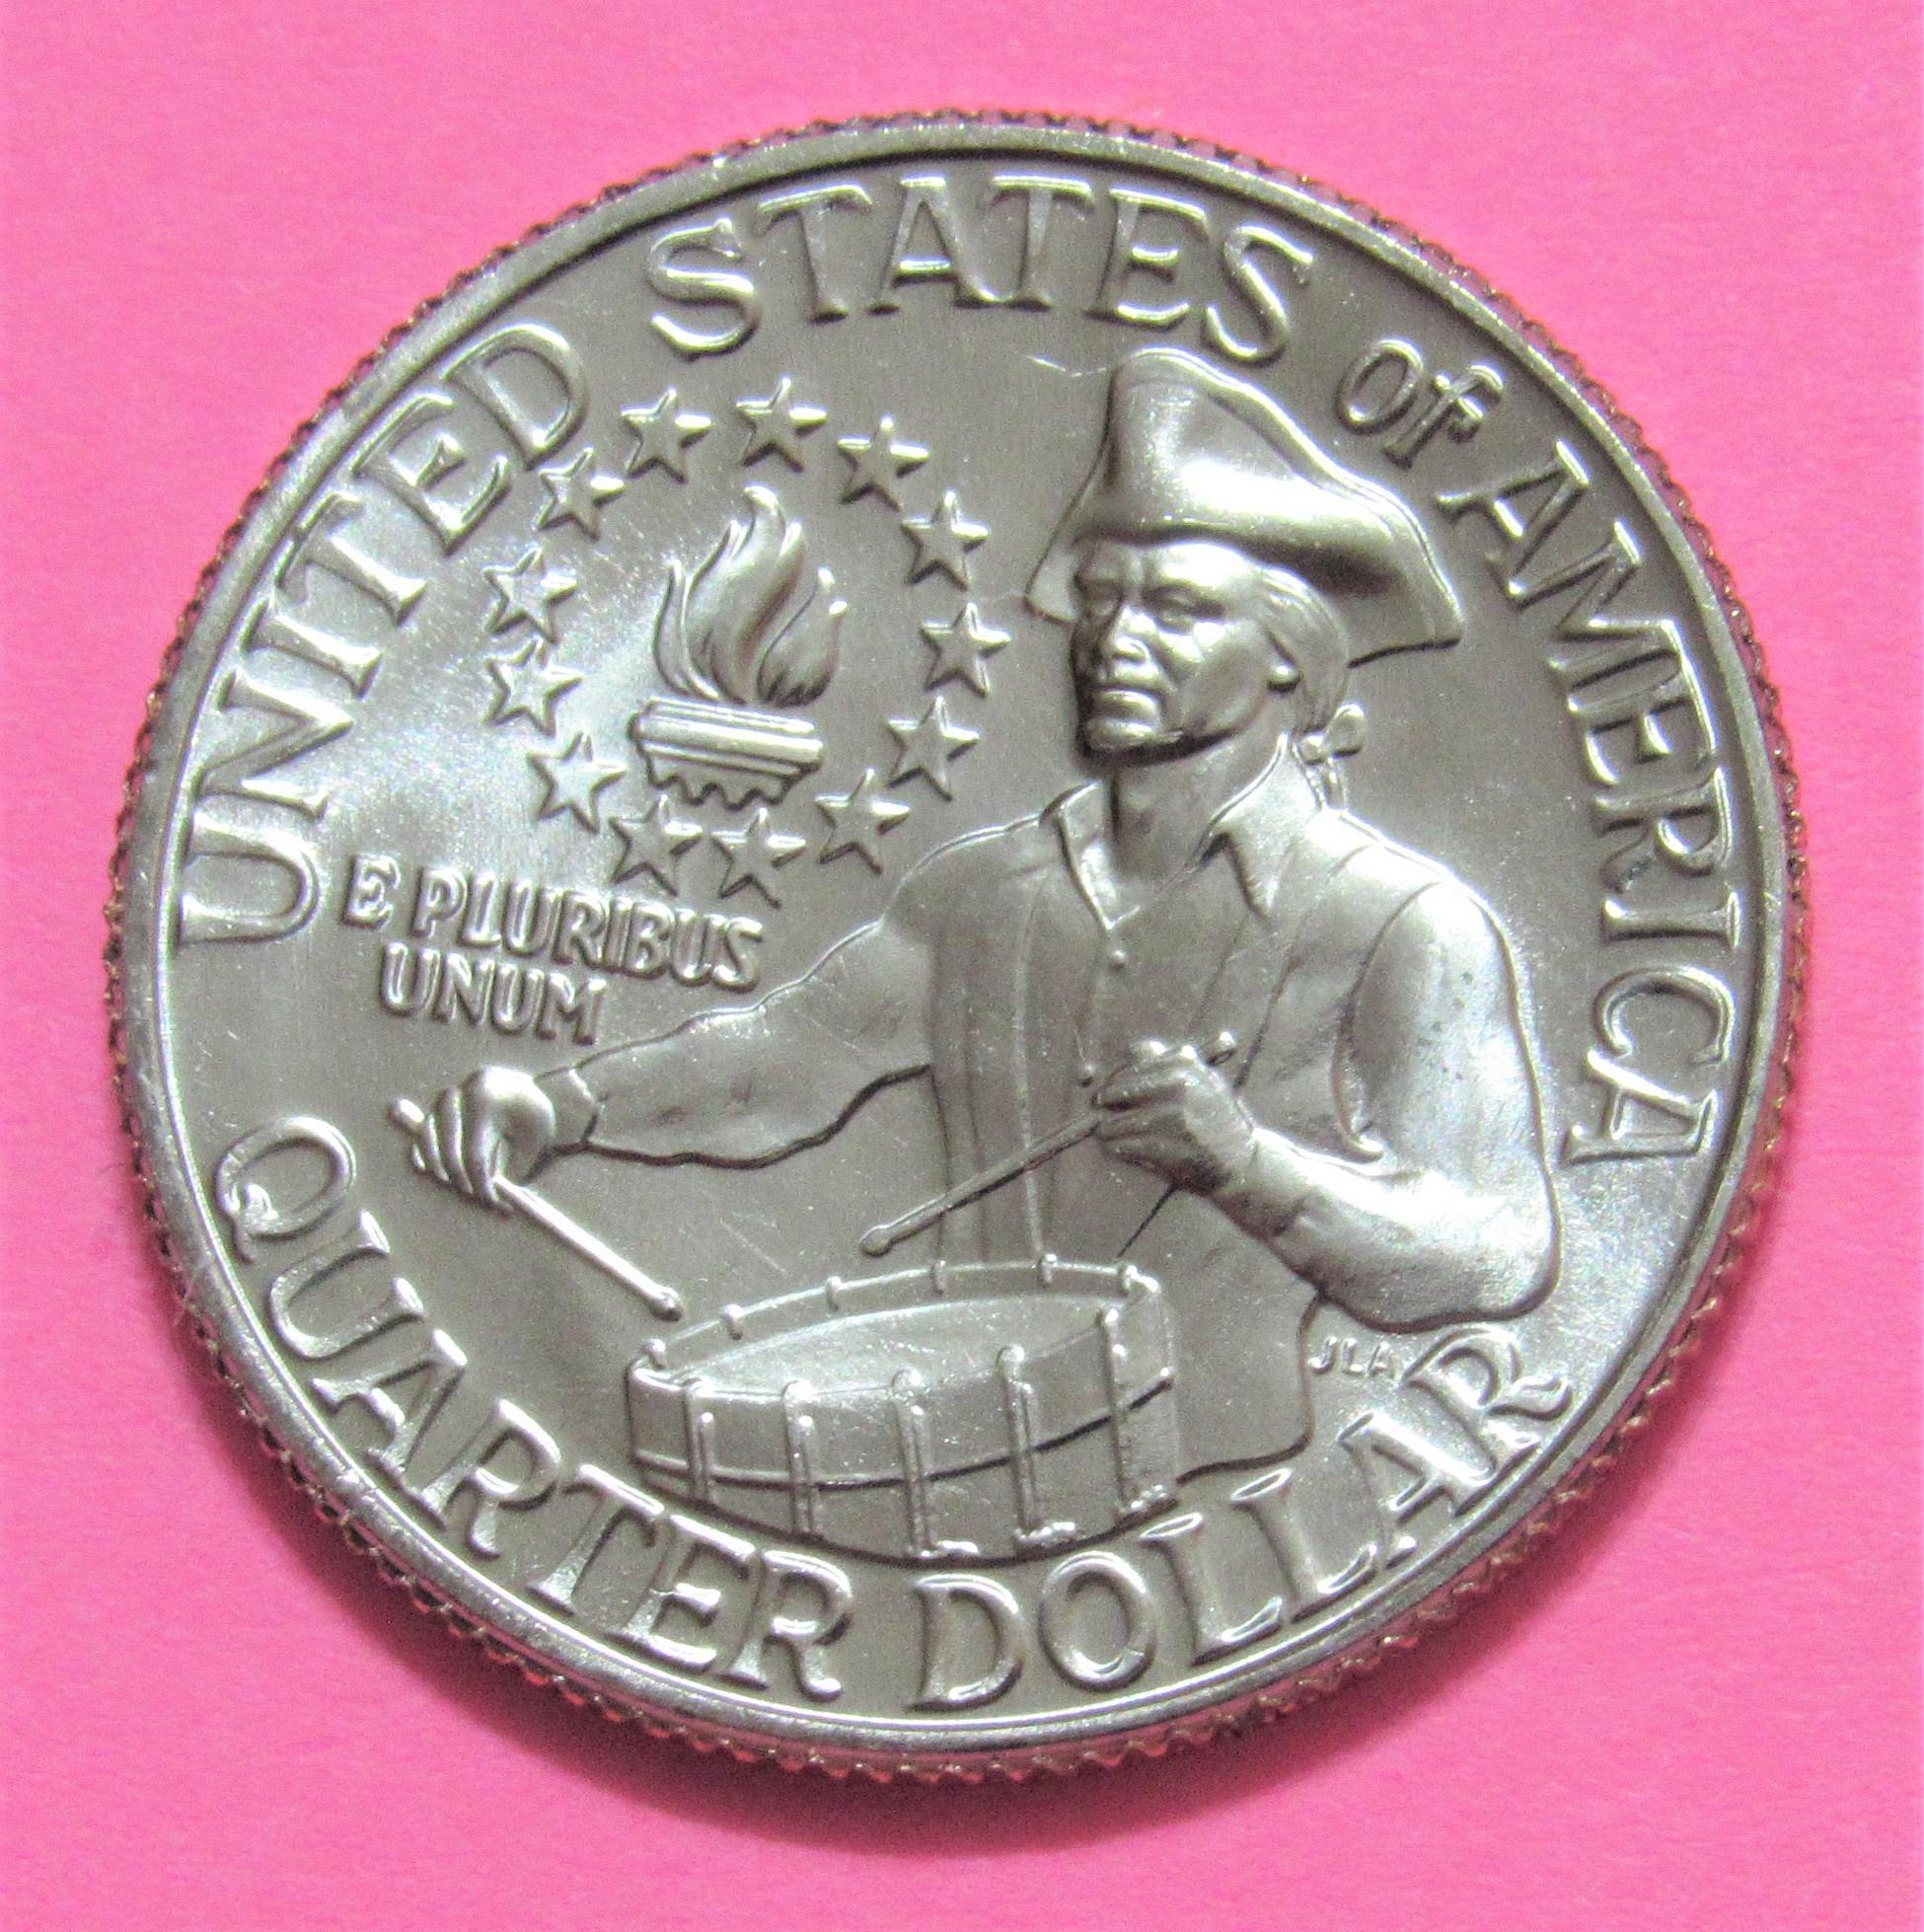 1976 D BU Washington Quarter From Mint Set Combined Shipping